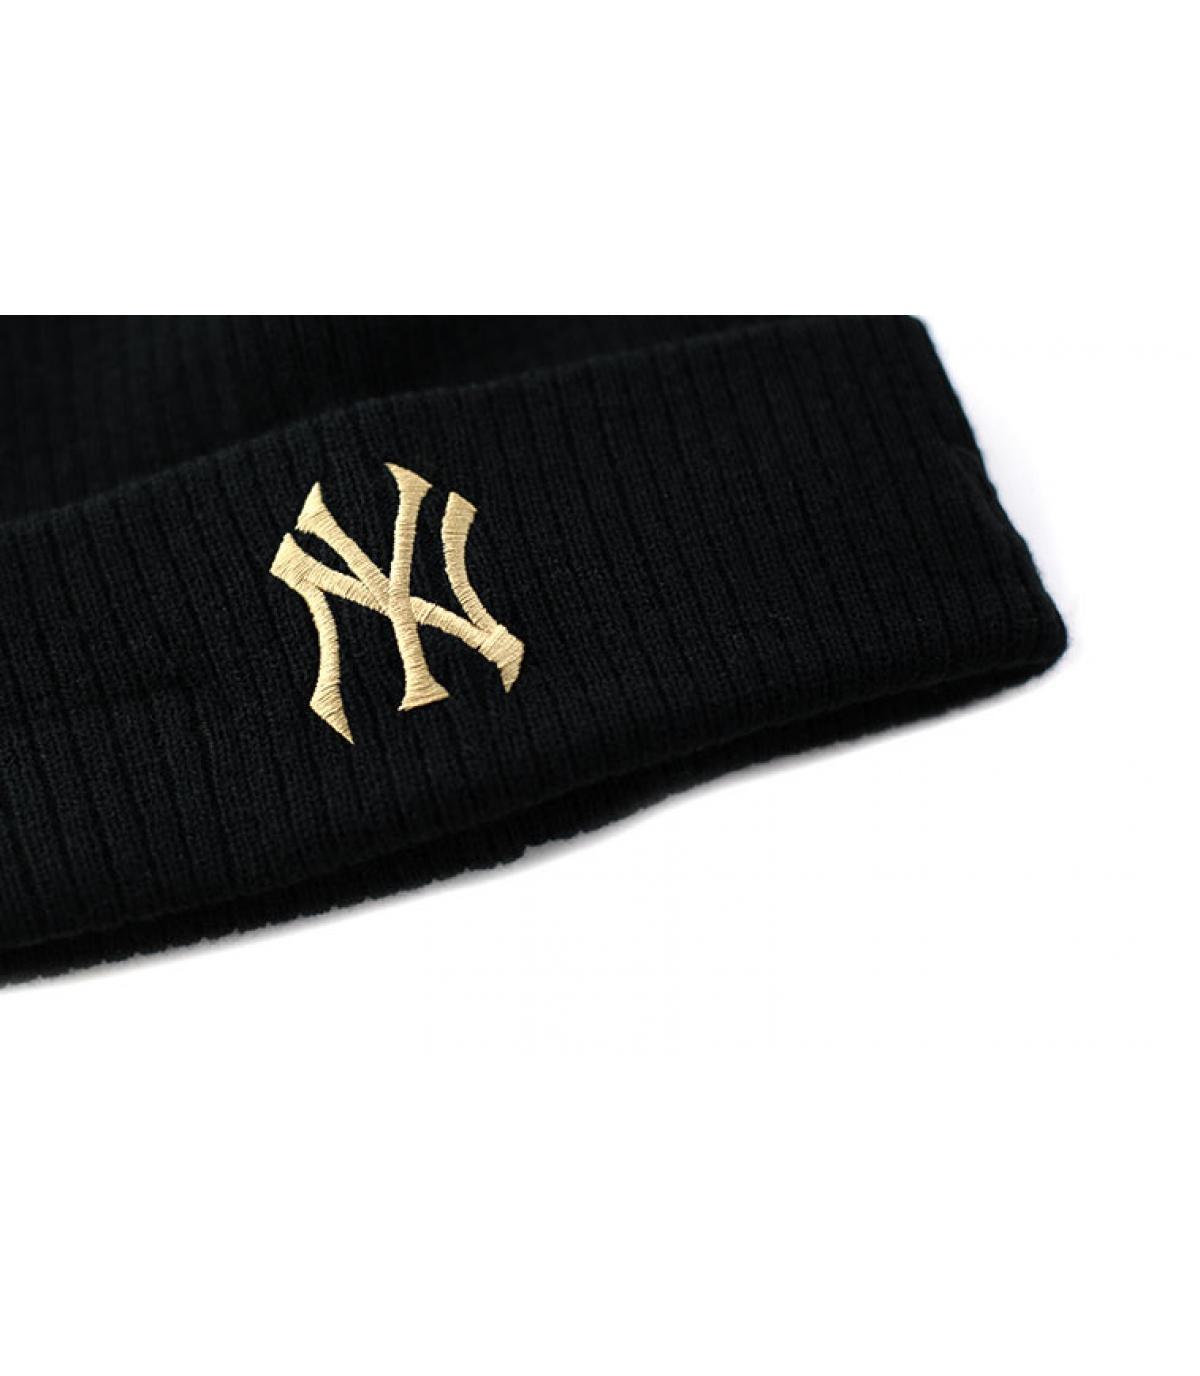 Dettagli Club Coop Knit NY black khaki - image 3